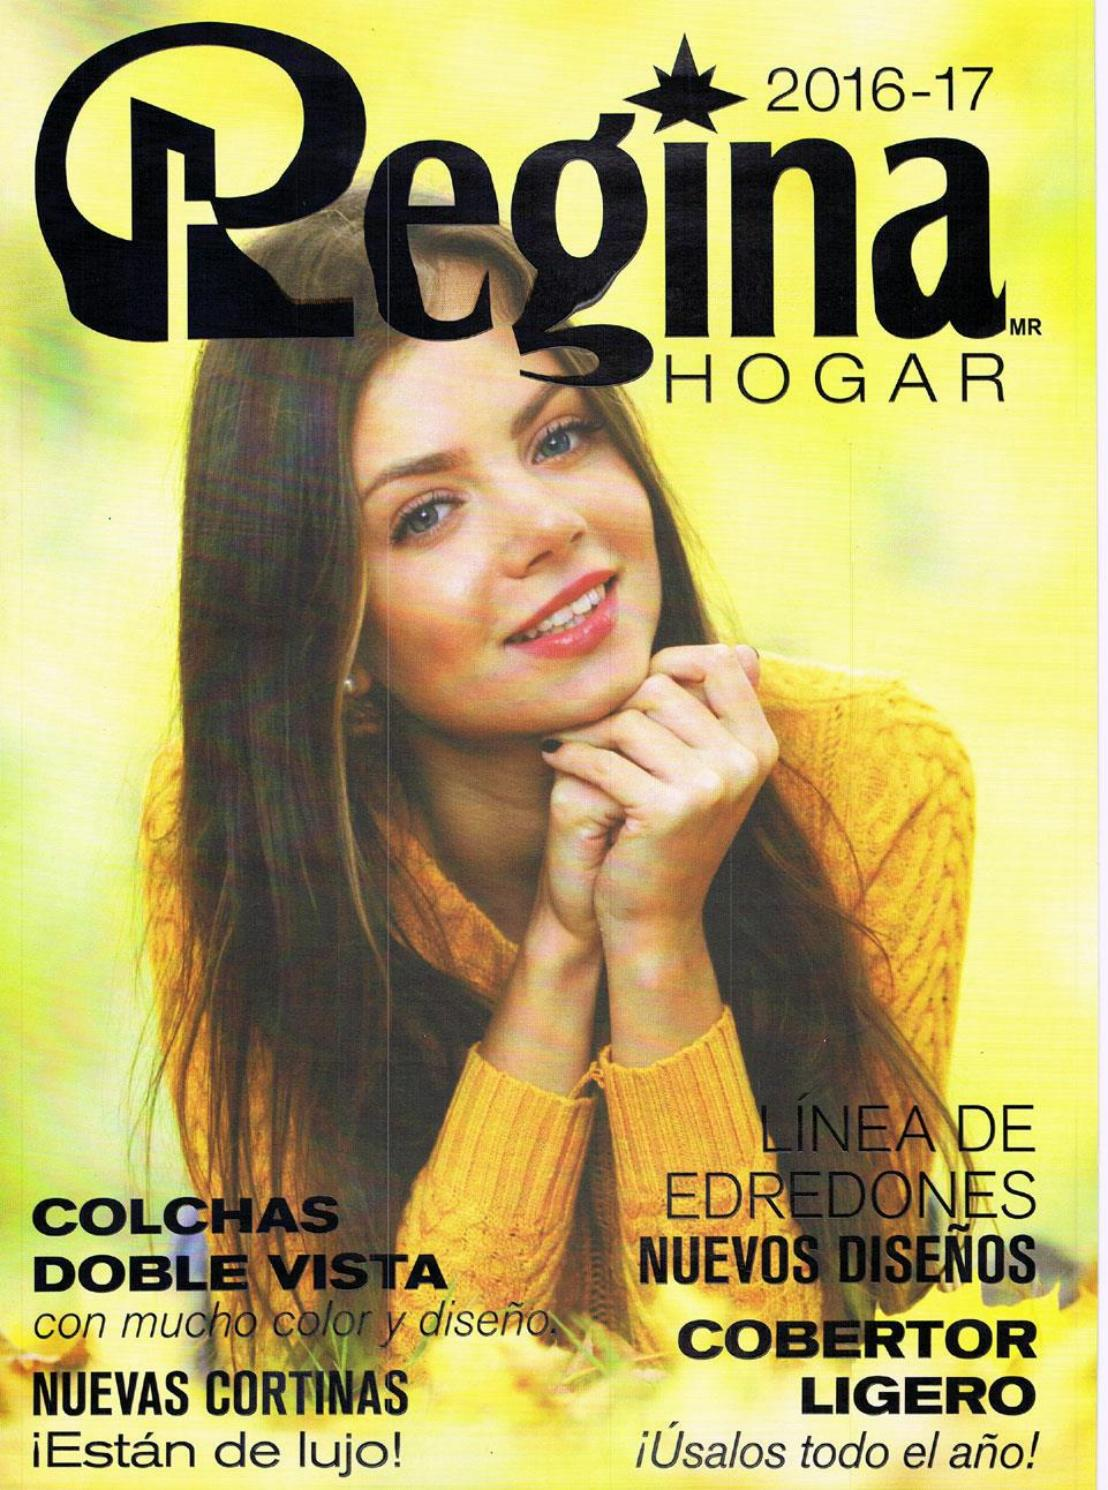 Catalogo regina hogar 2016 2017 by catalogos por internet for Catalogo bricoman orbassano 2017